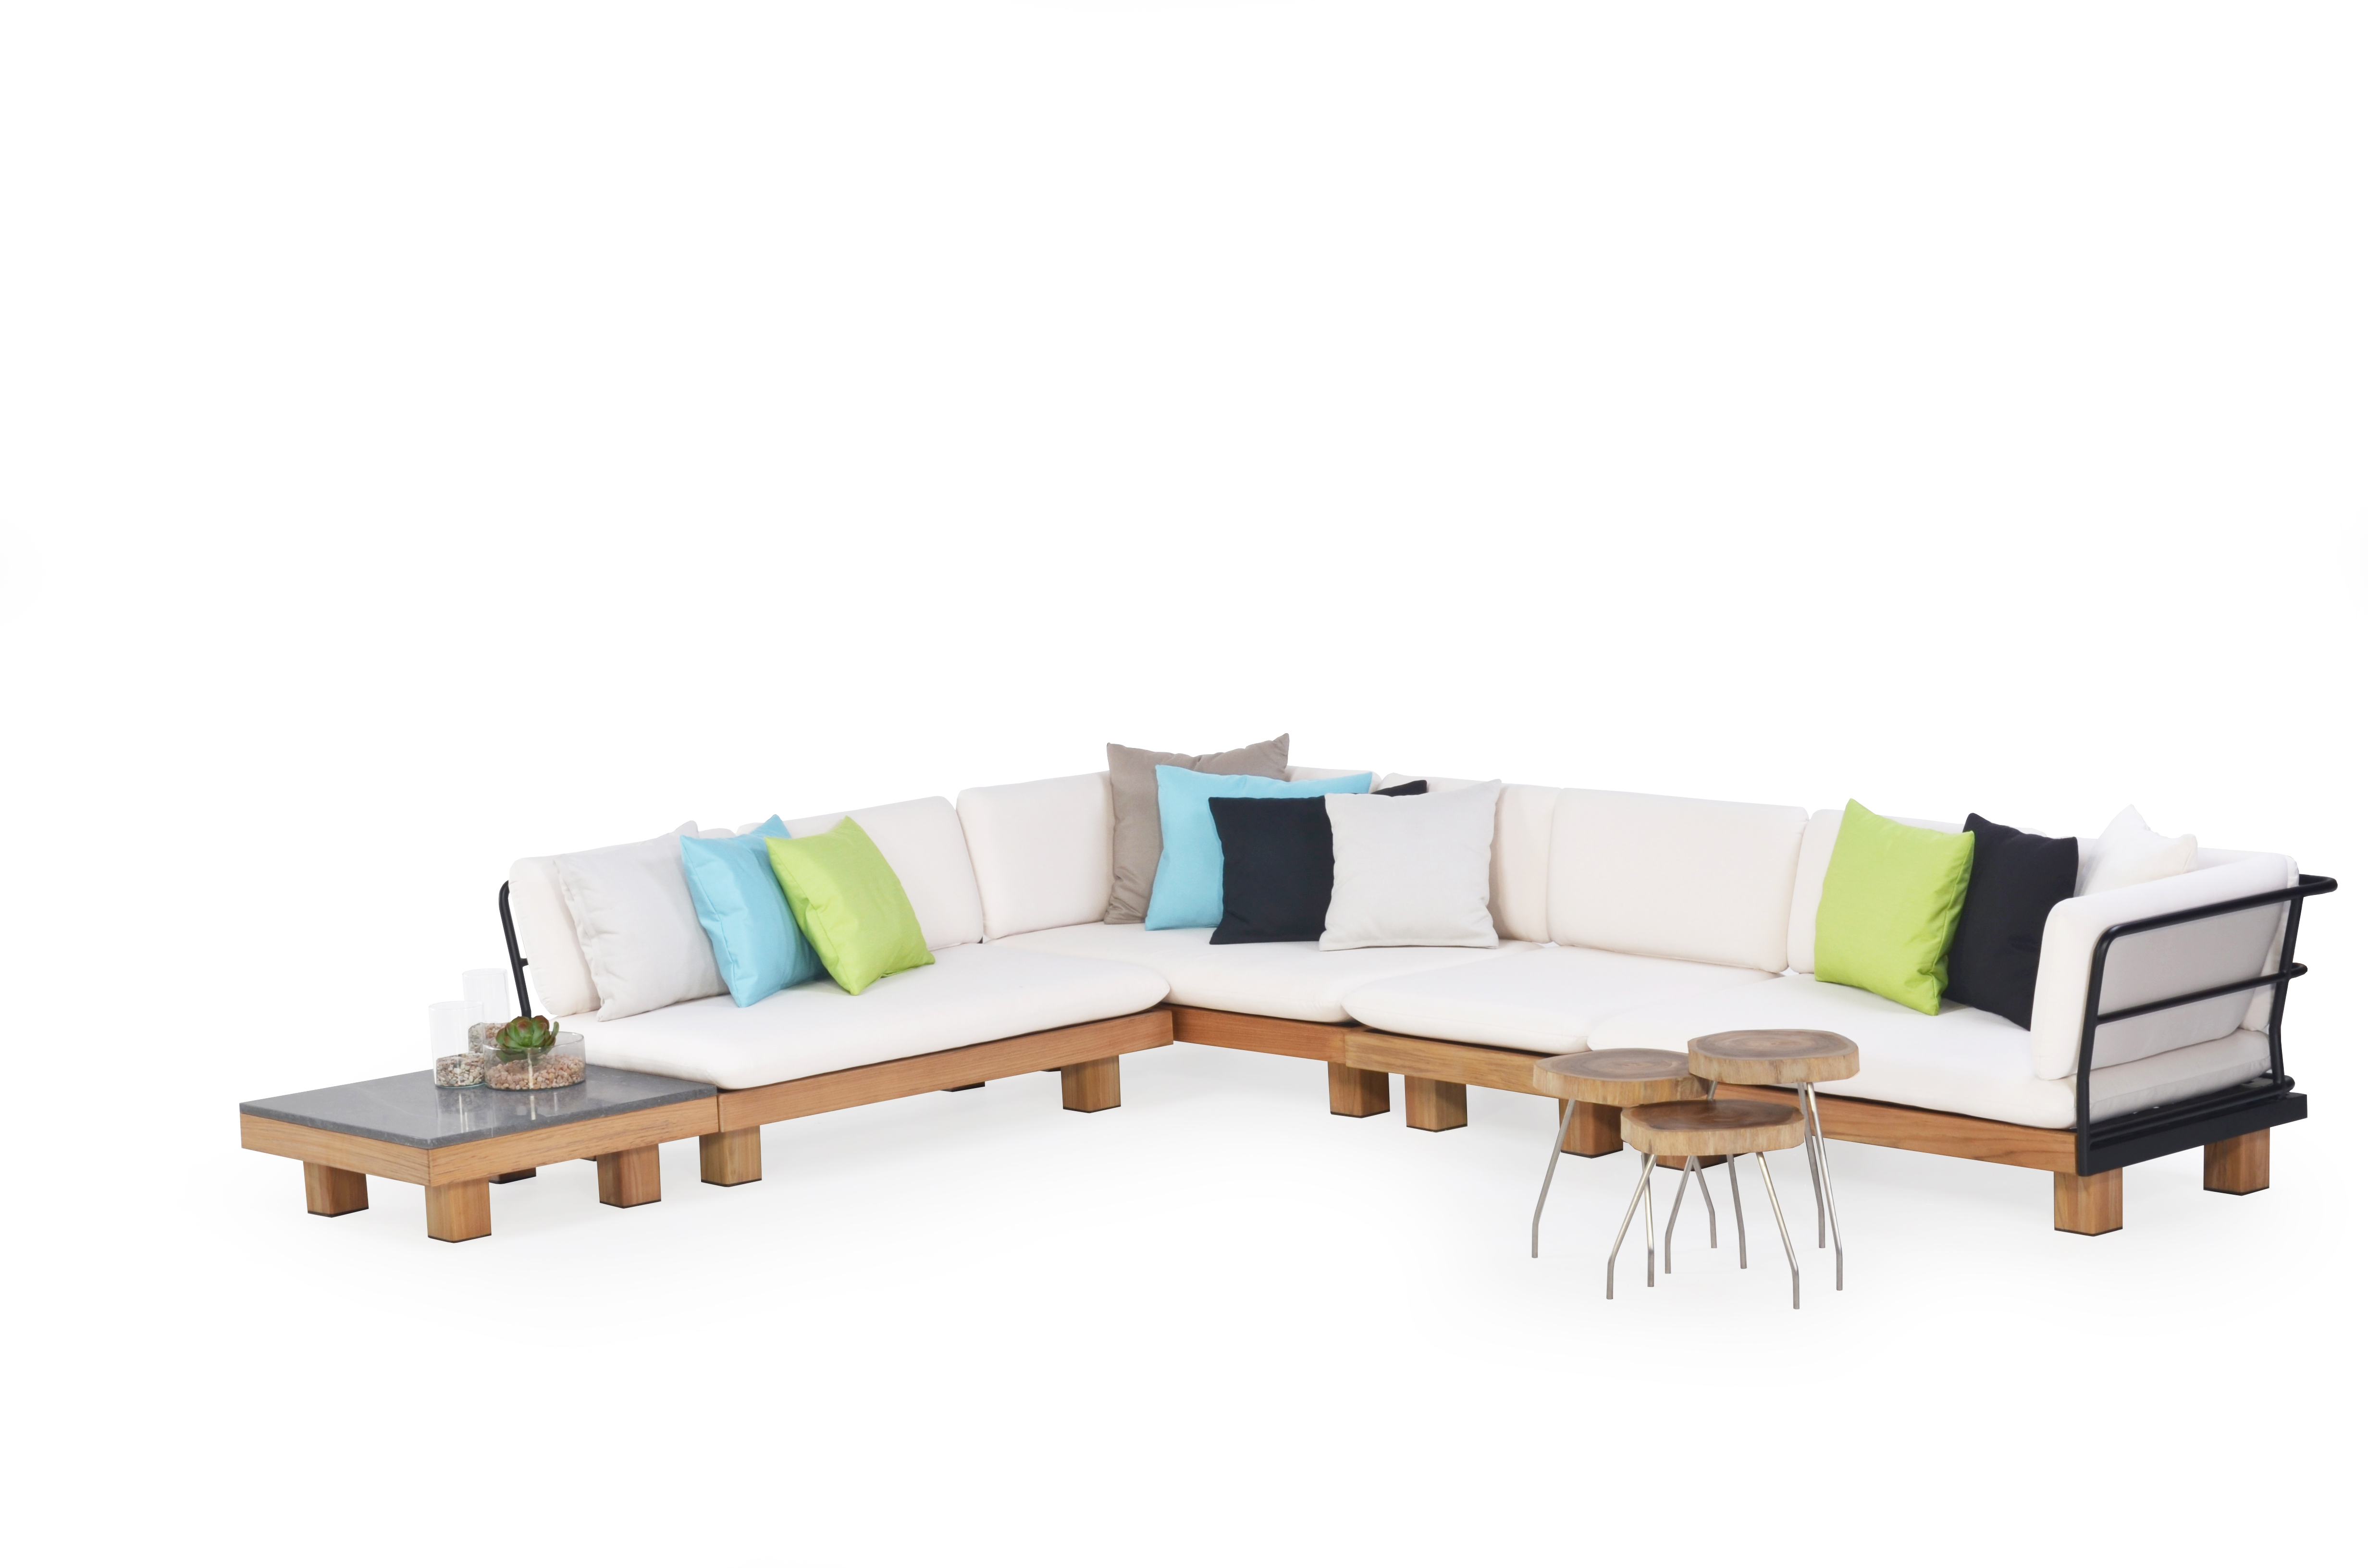 Alura Sectional Sofa Corner Element Modern Teak Pool Furniture Contract  Outdoor